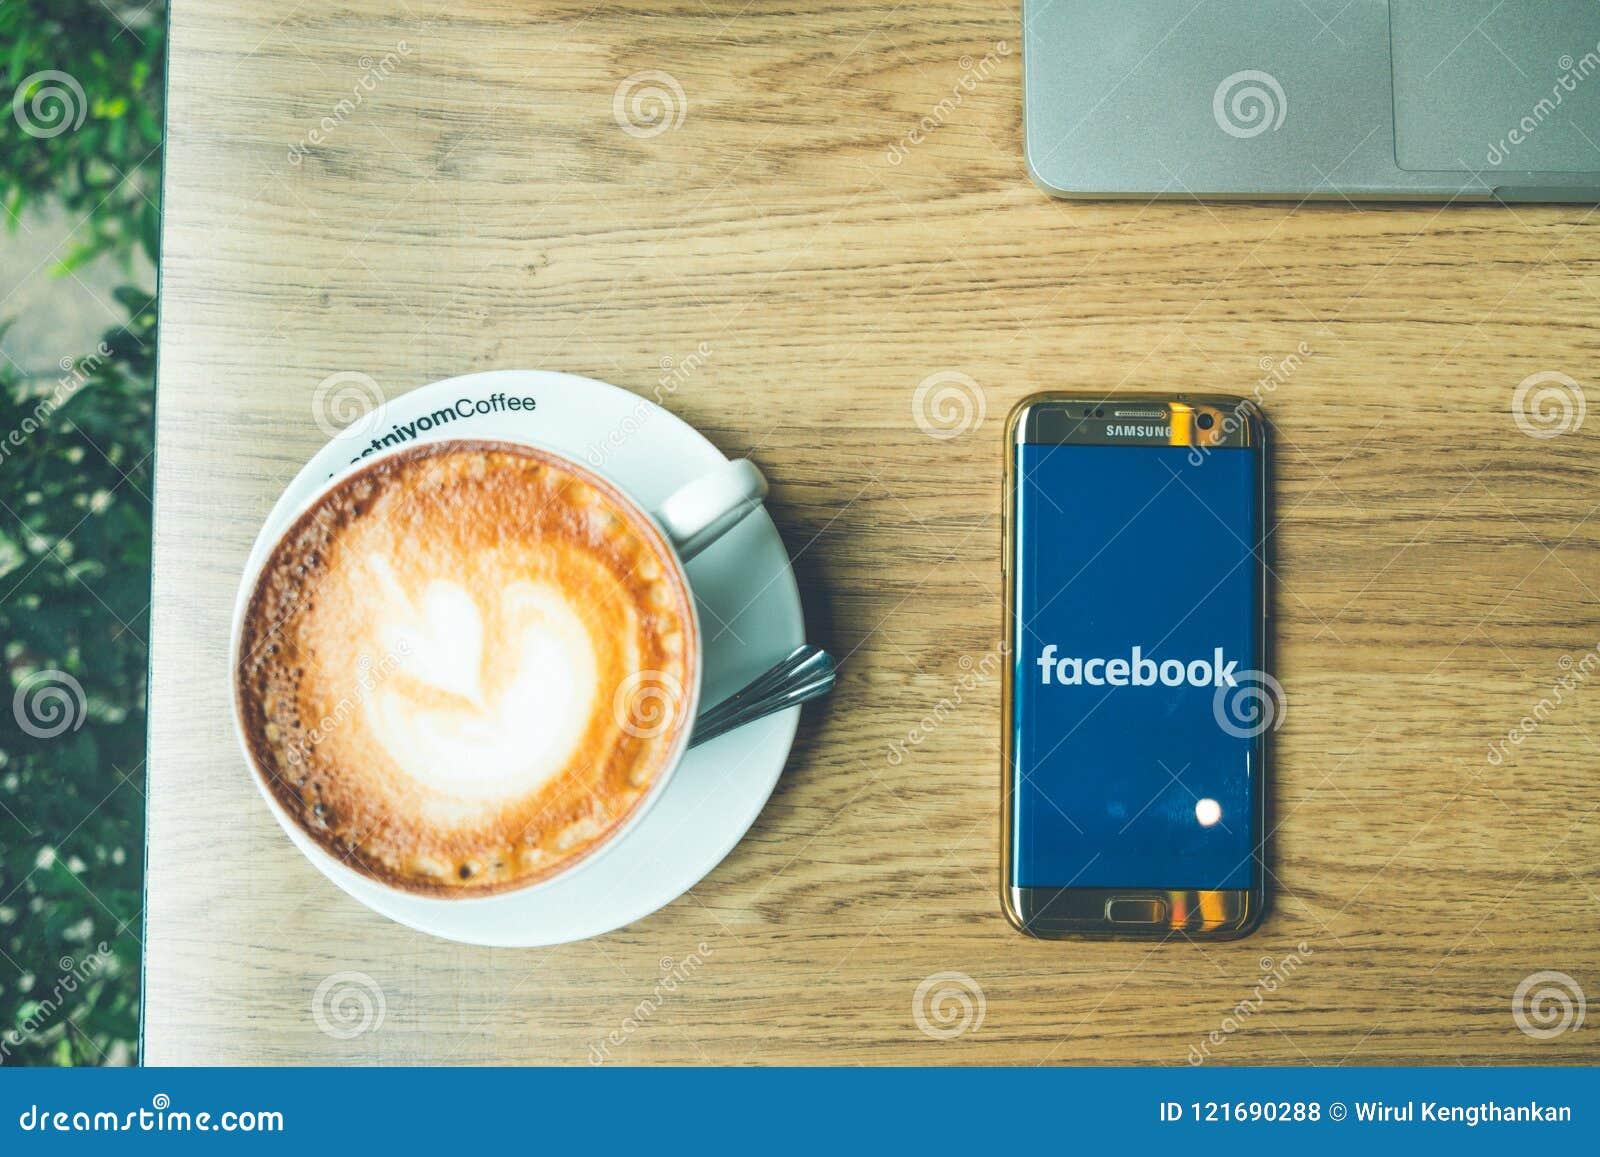 CHIANG MAI, ΤΑΪΛΆΝΔΗΣ - 26.2018 Ιουνίου: Τοπ άποψη του καυτού coffe Latte